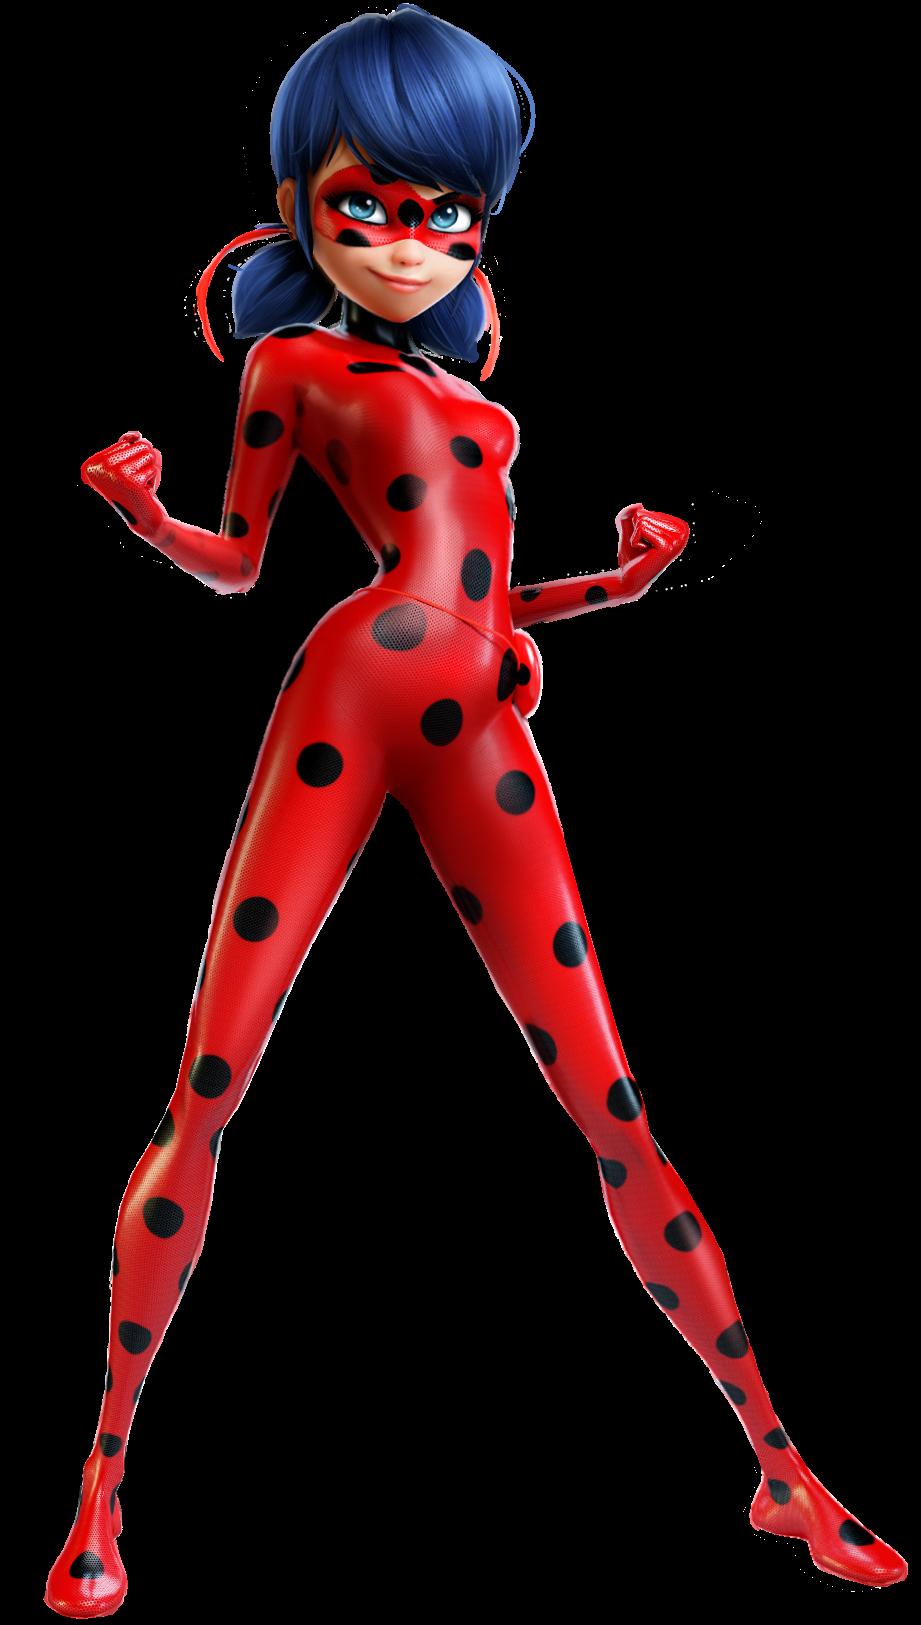 Ladybug Png Free Download Ladybug Clipart Images Free